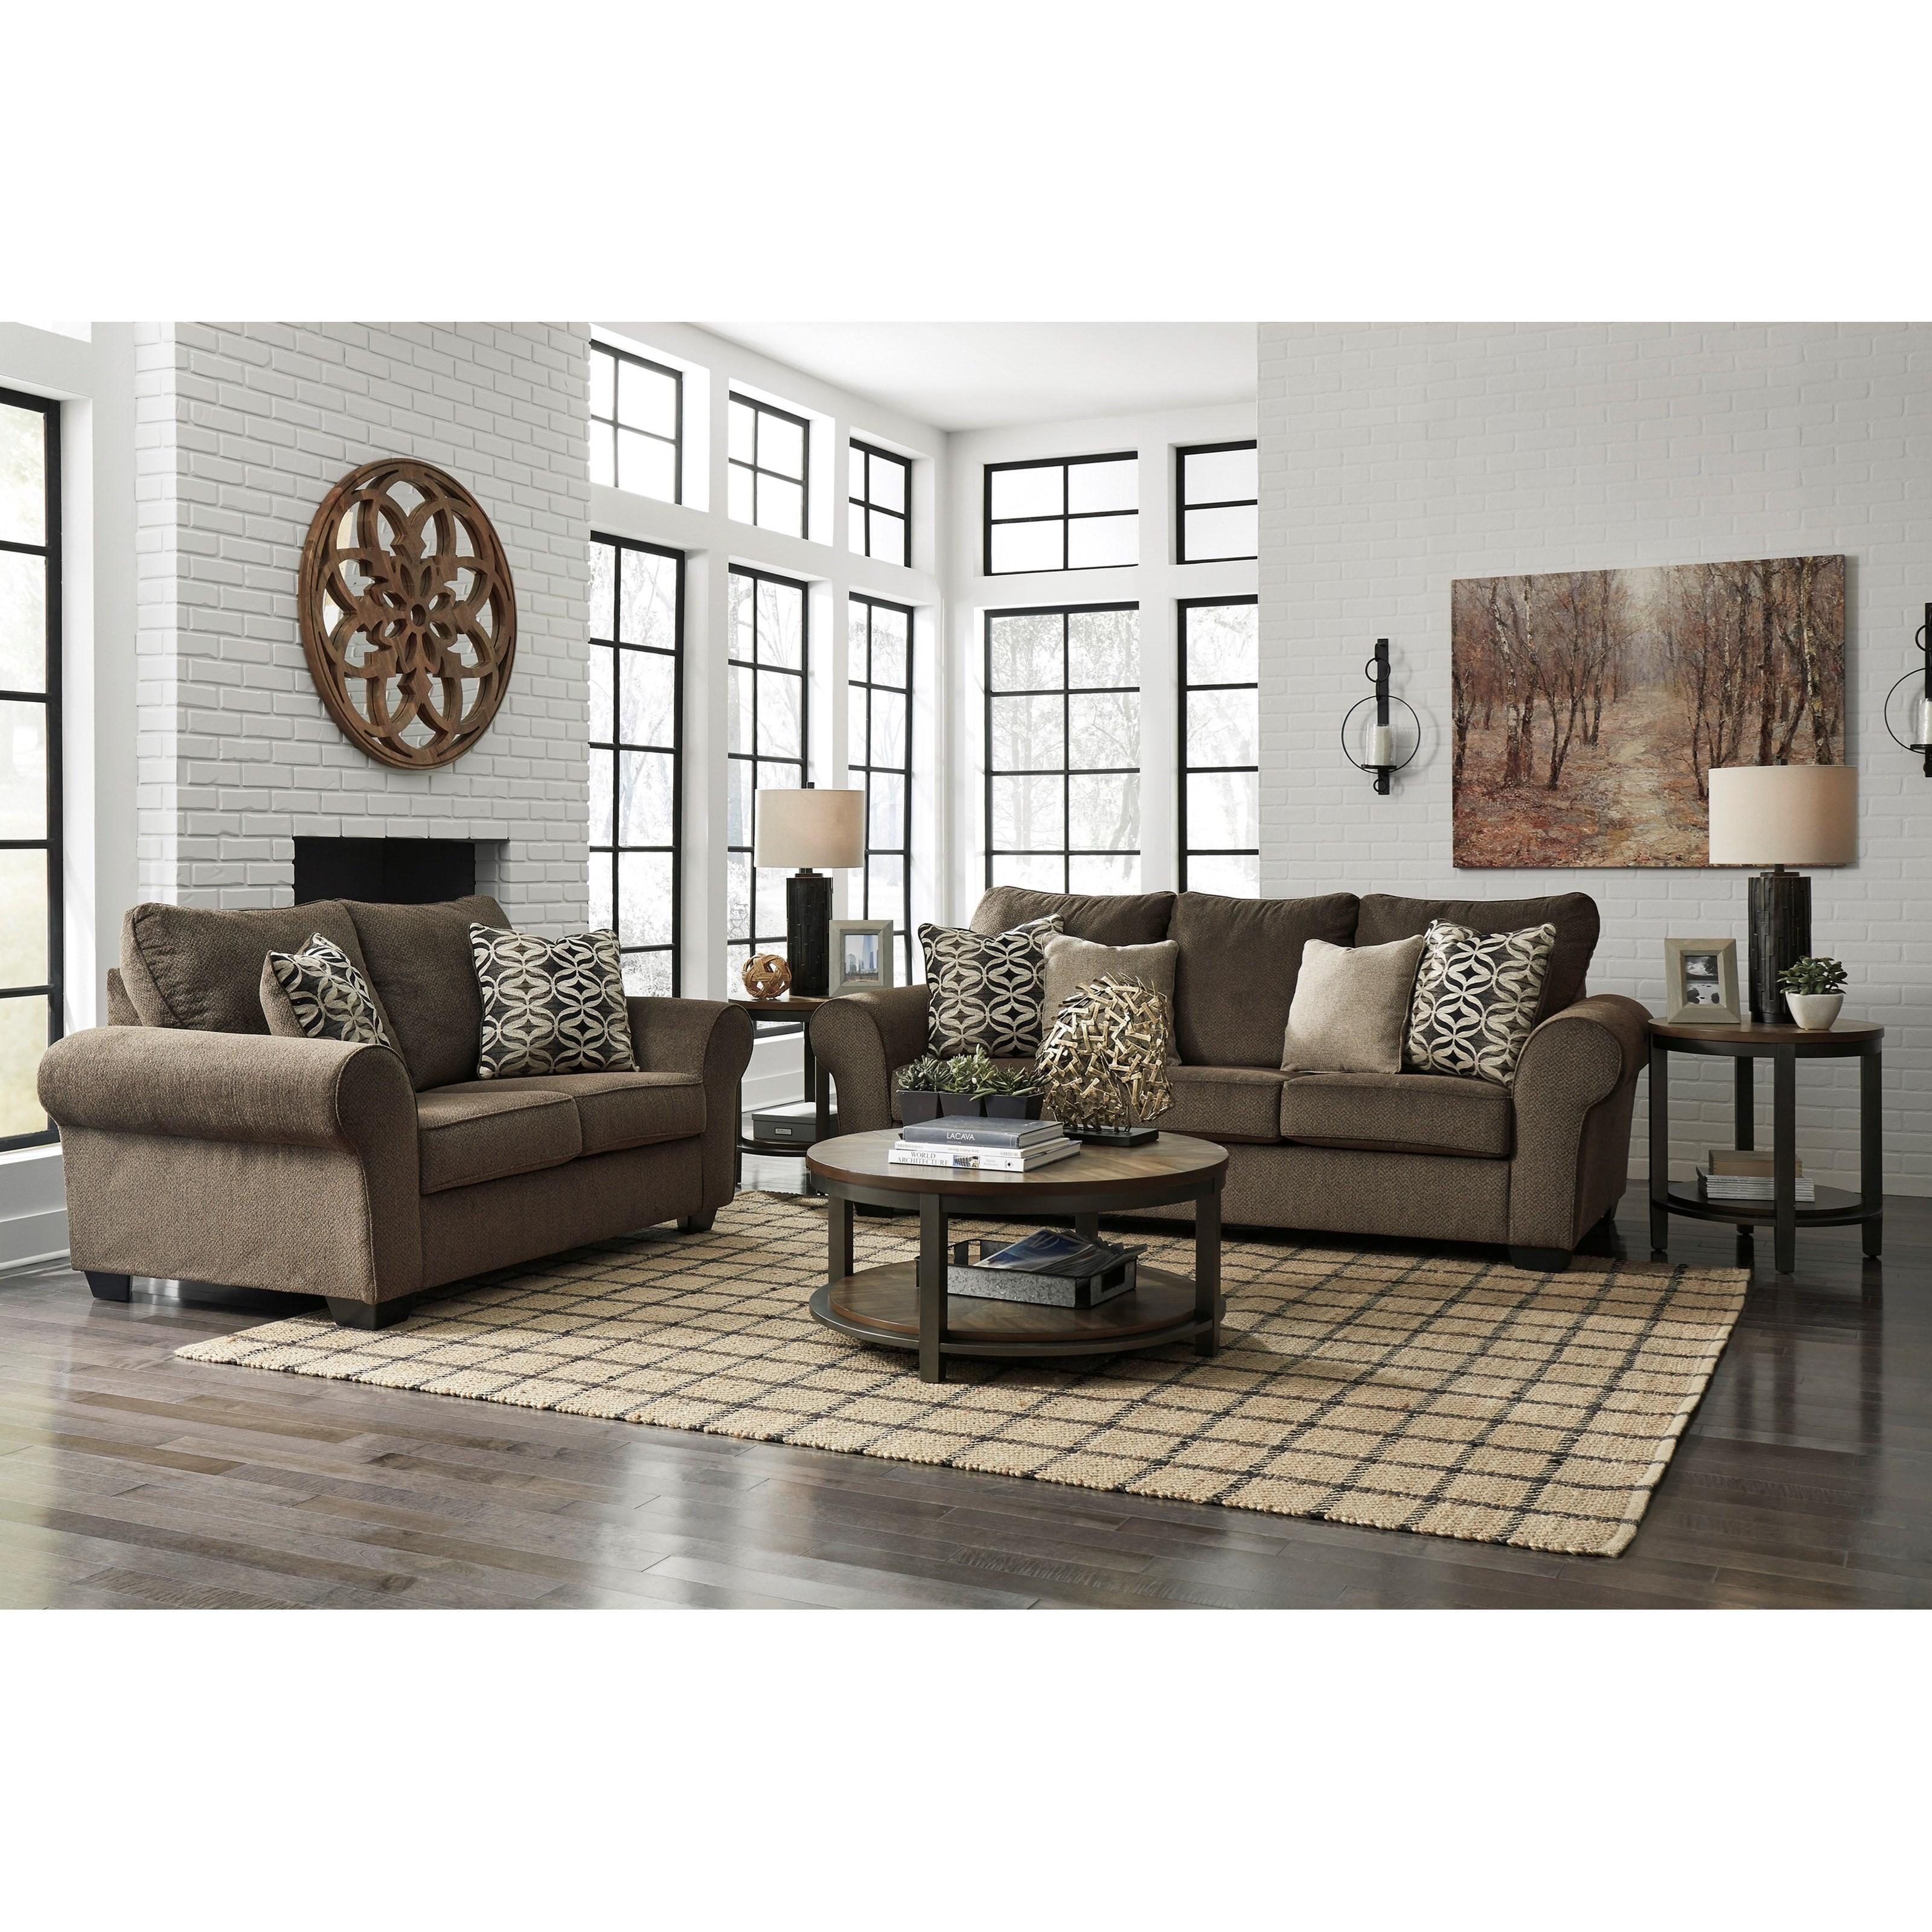 Living Room Sets Houston: Benchcraft Nesso Stationary Living Room Group